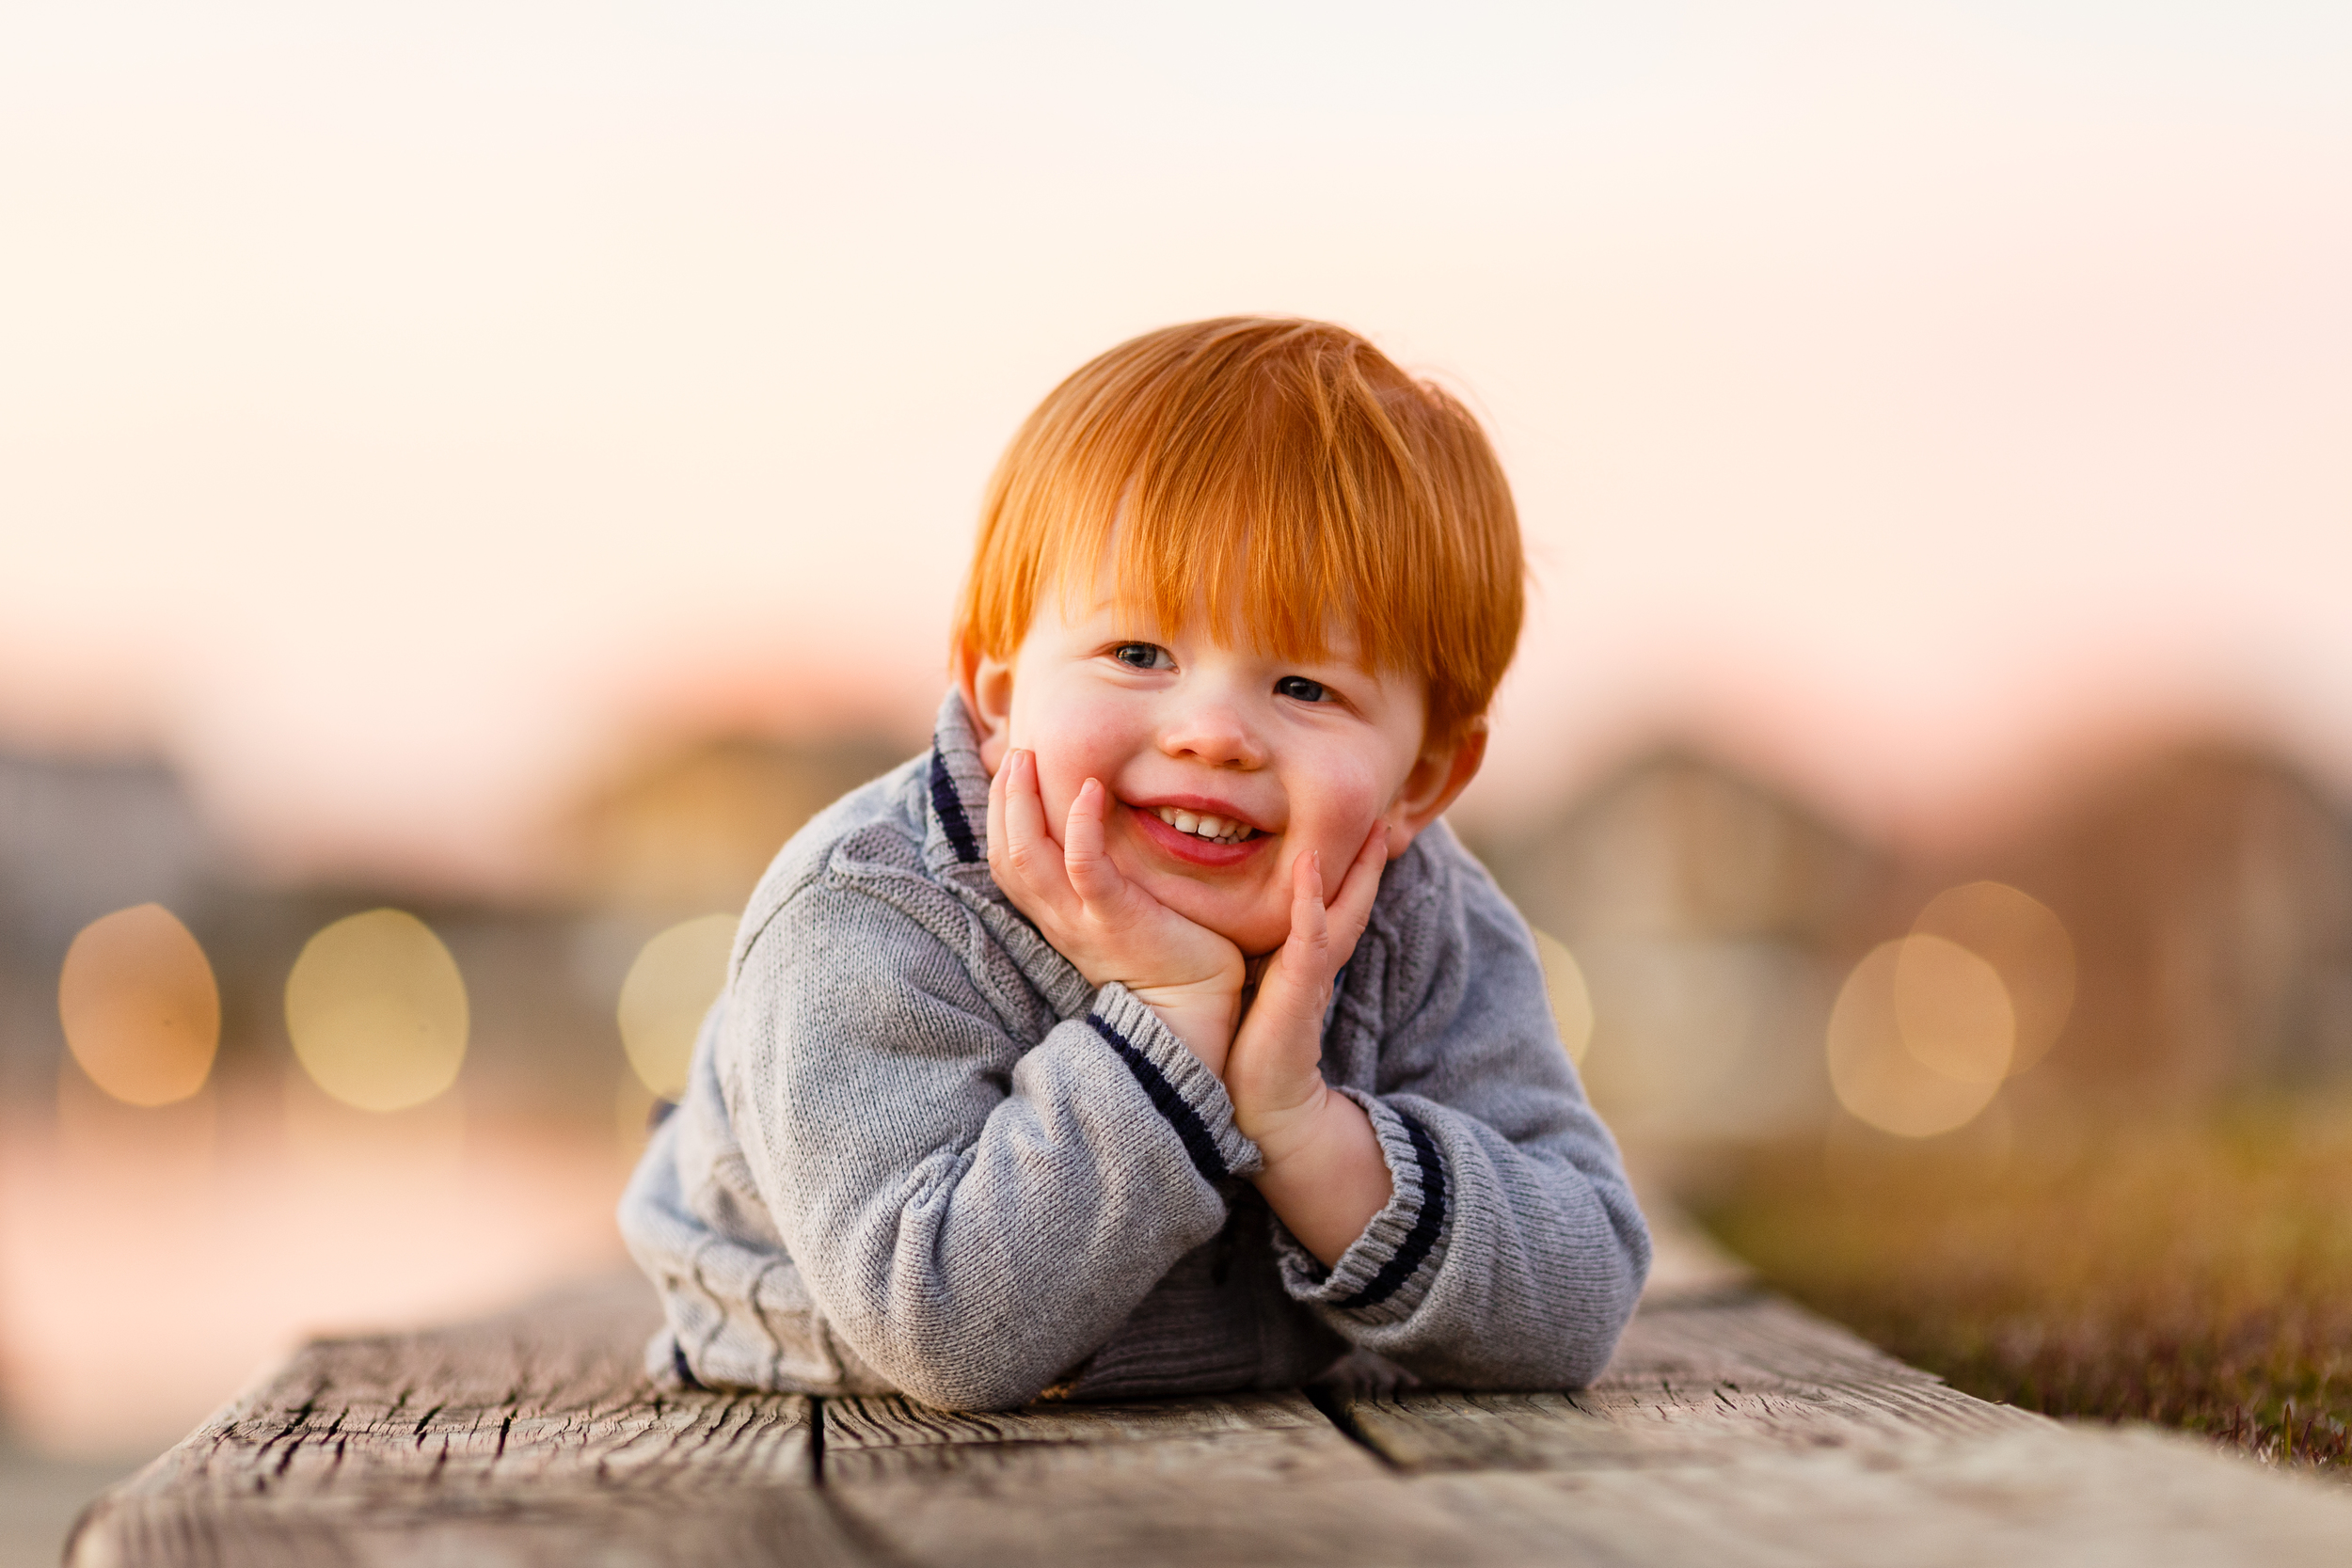 Family-child-portrait-lafayette-broussard-youngsville-photographer-1.jpg